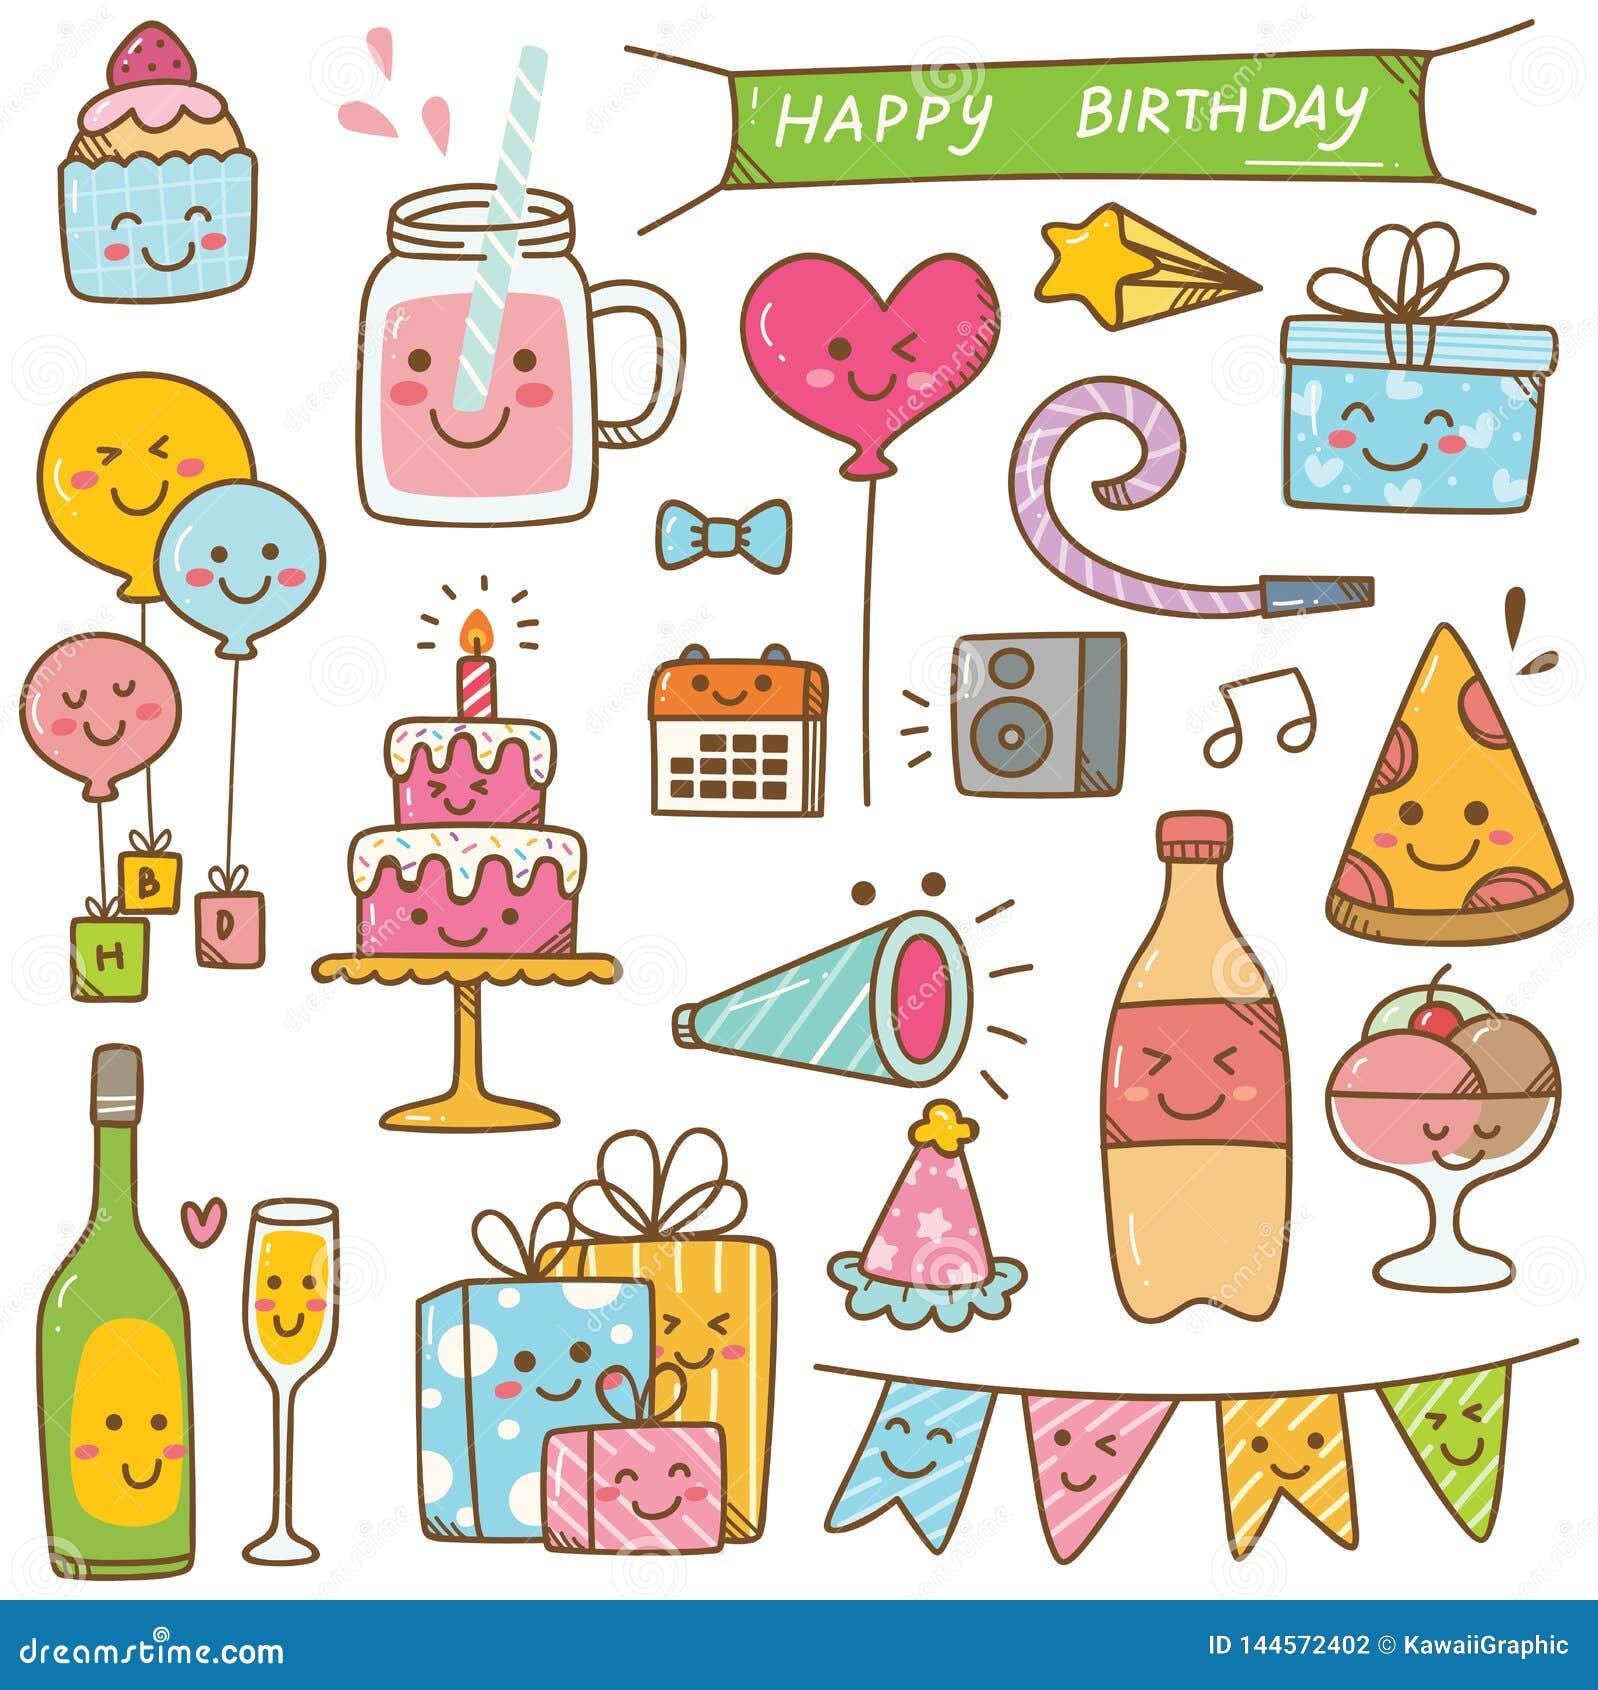 Kawaii style birthday doodle isolated on white background